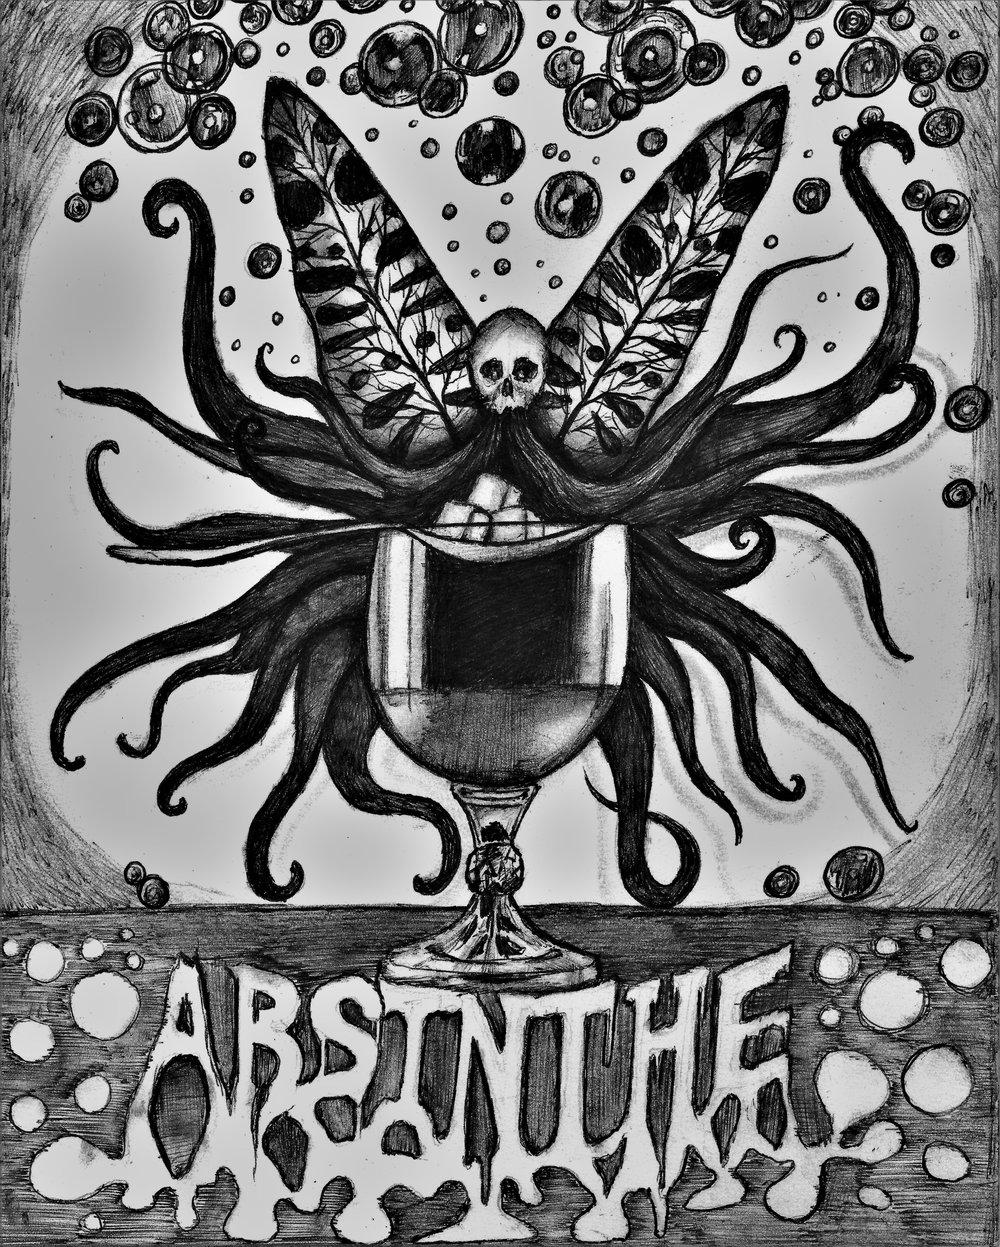 (Absinthe) pen on paper